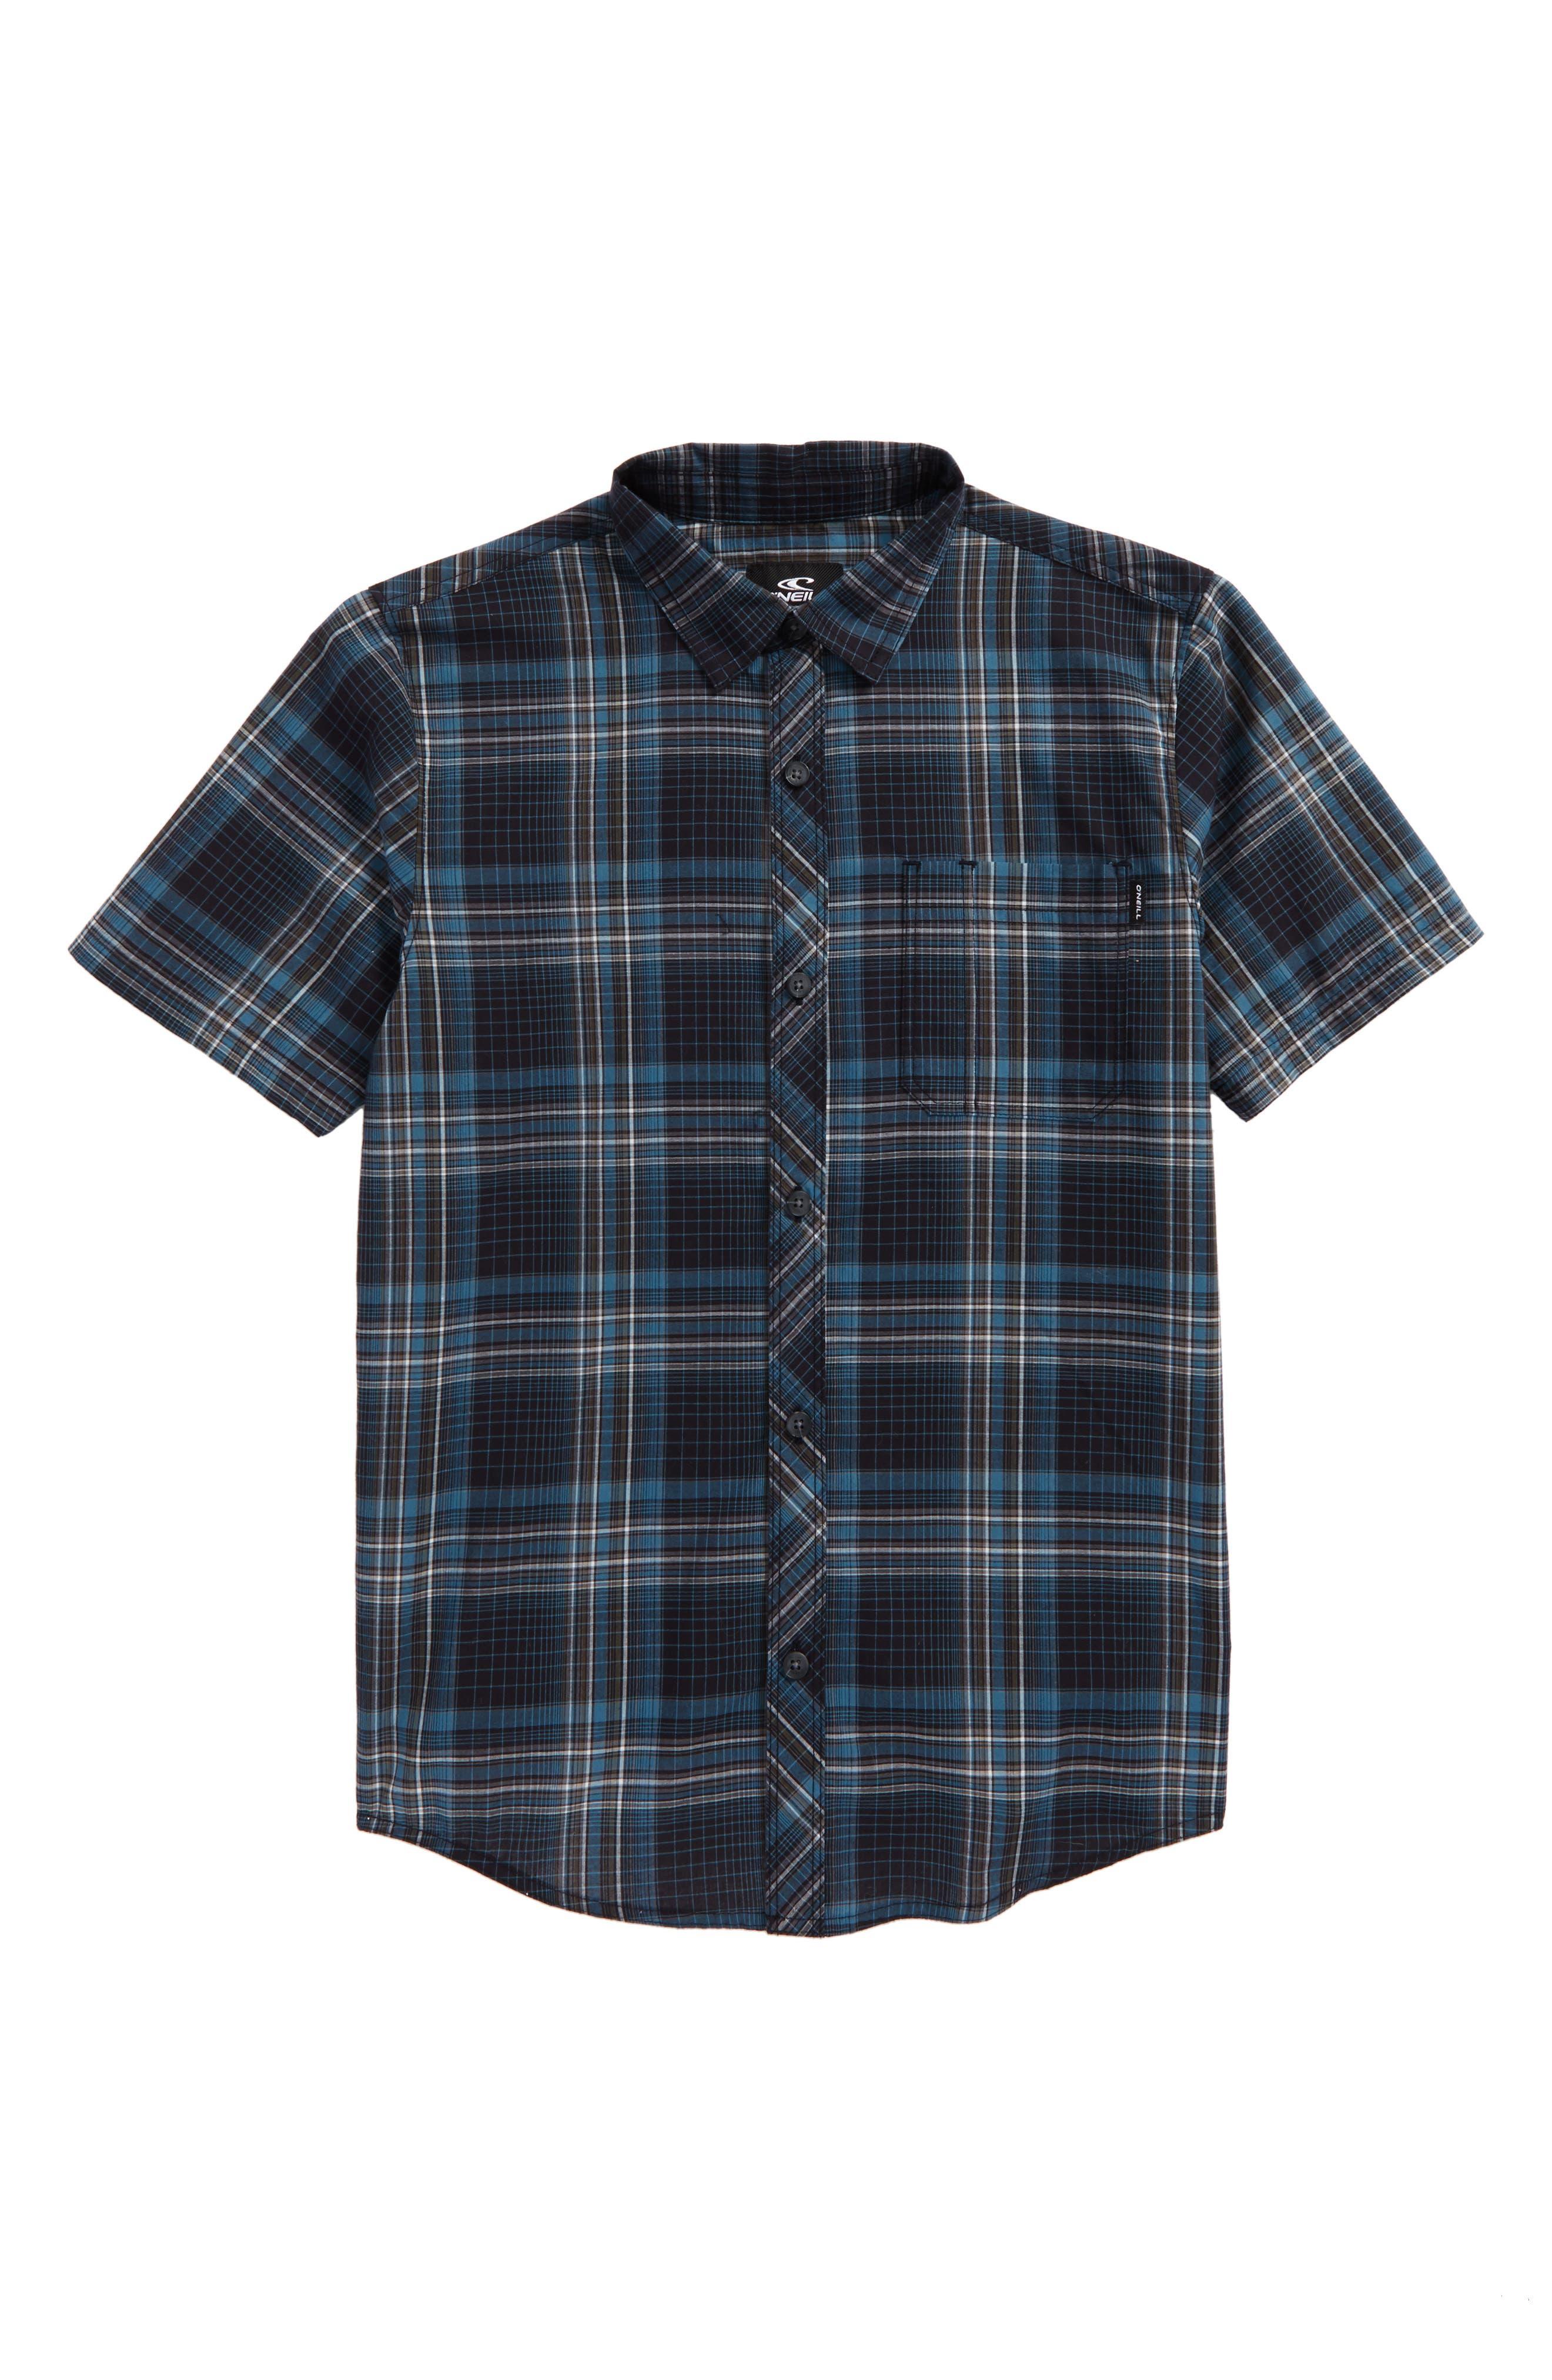 Sturghill Plaid Woven Shirt,                             Main thumbnail 1, color,                             Dark Navy